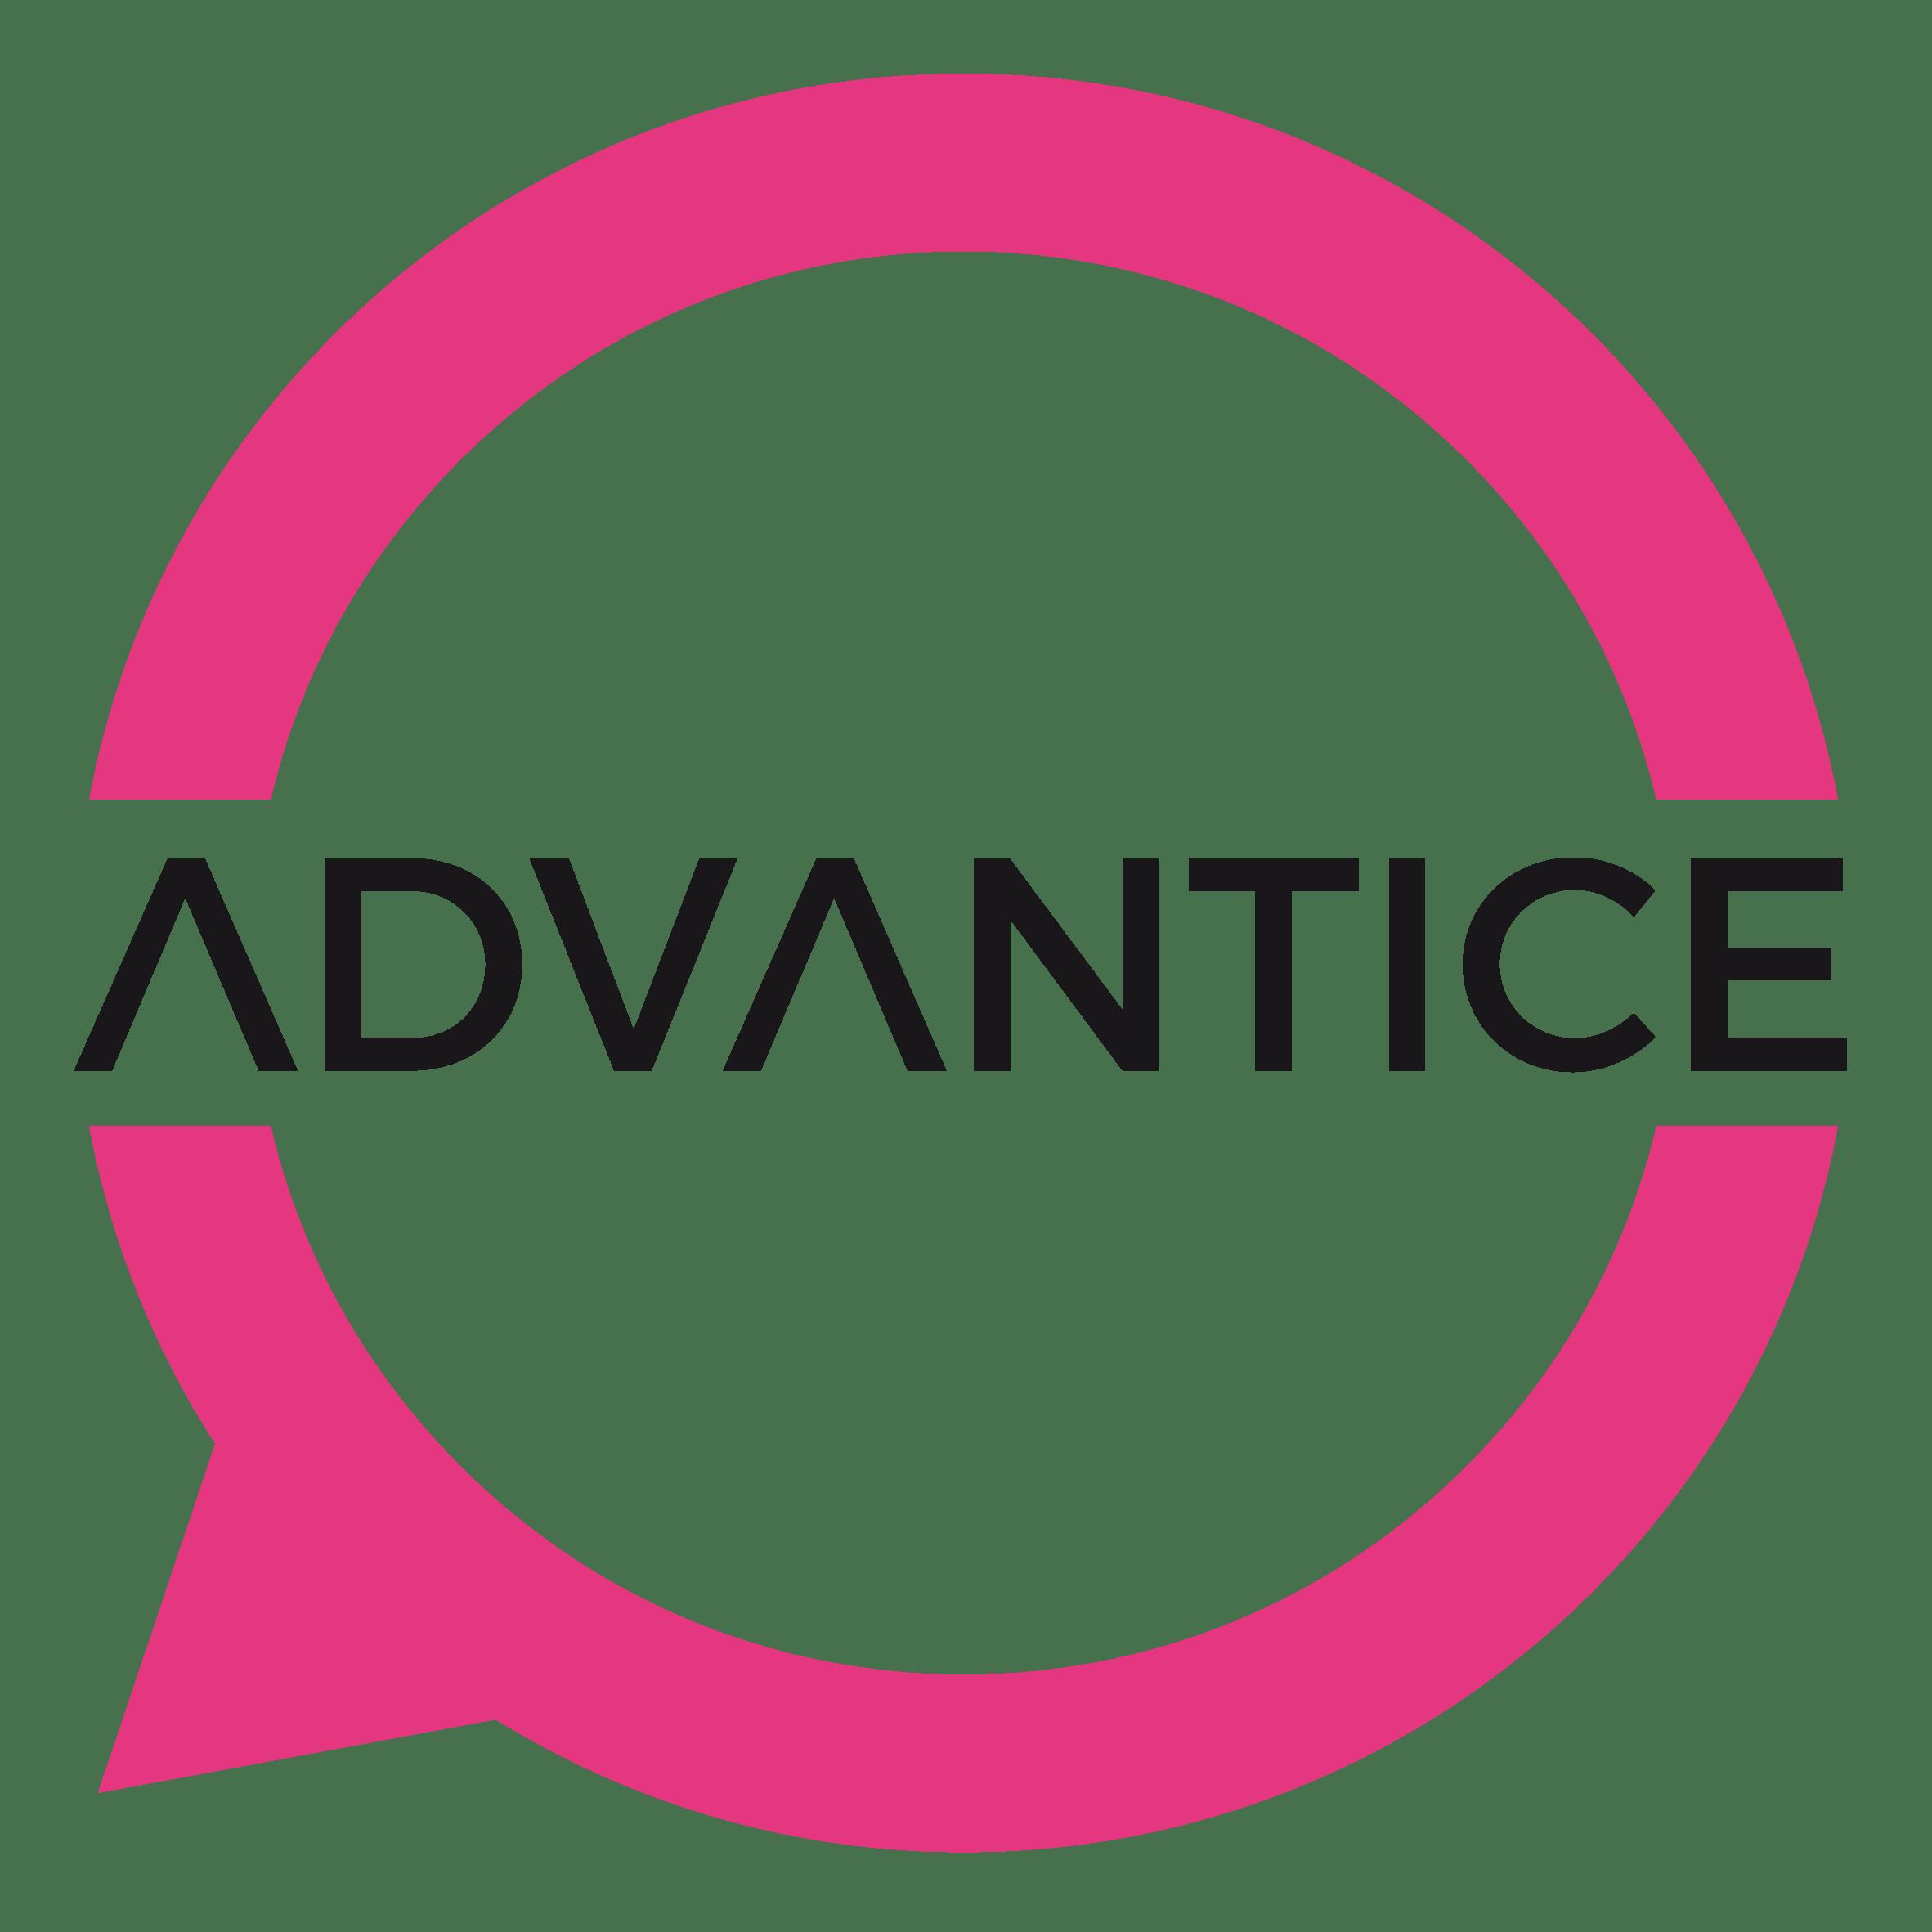 Advantice